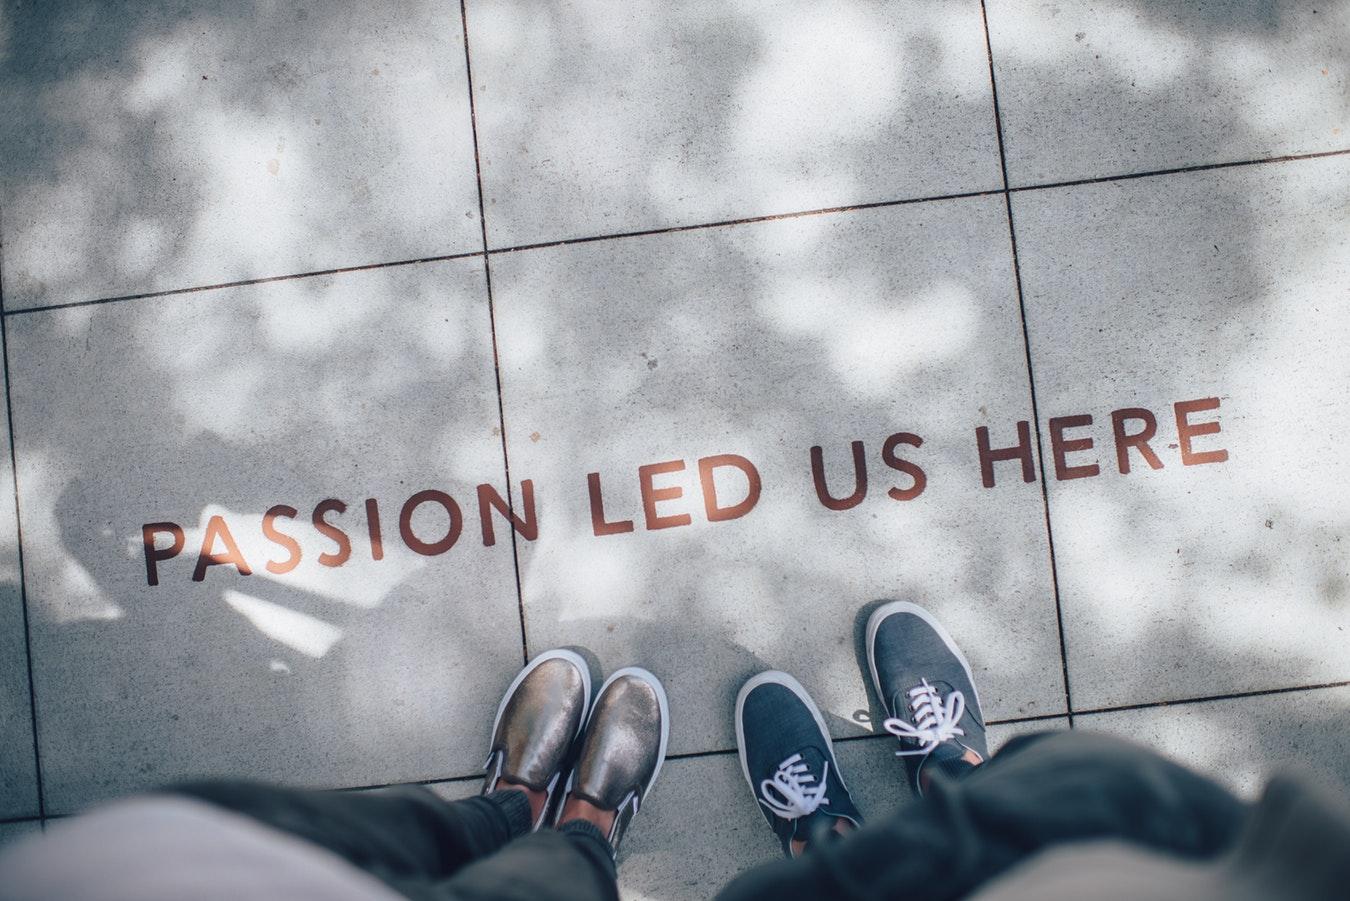 """Passion Led Us Here"" sidewalk inscription"